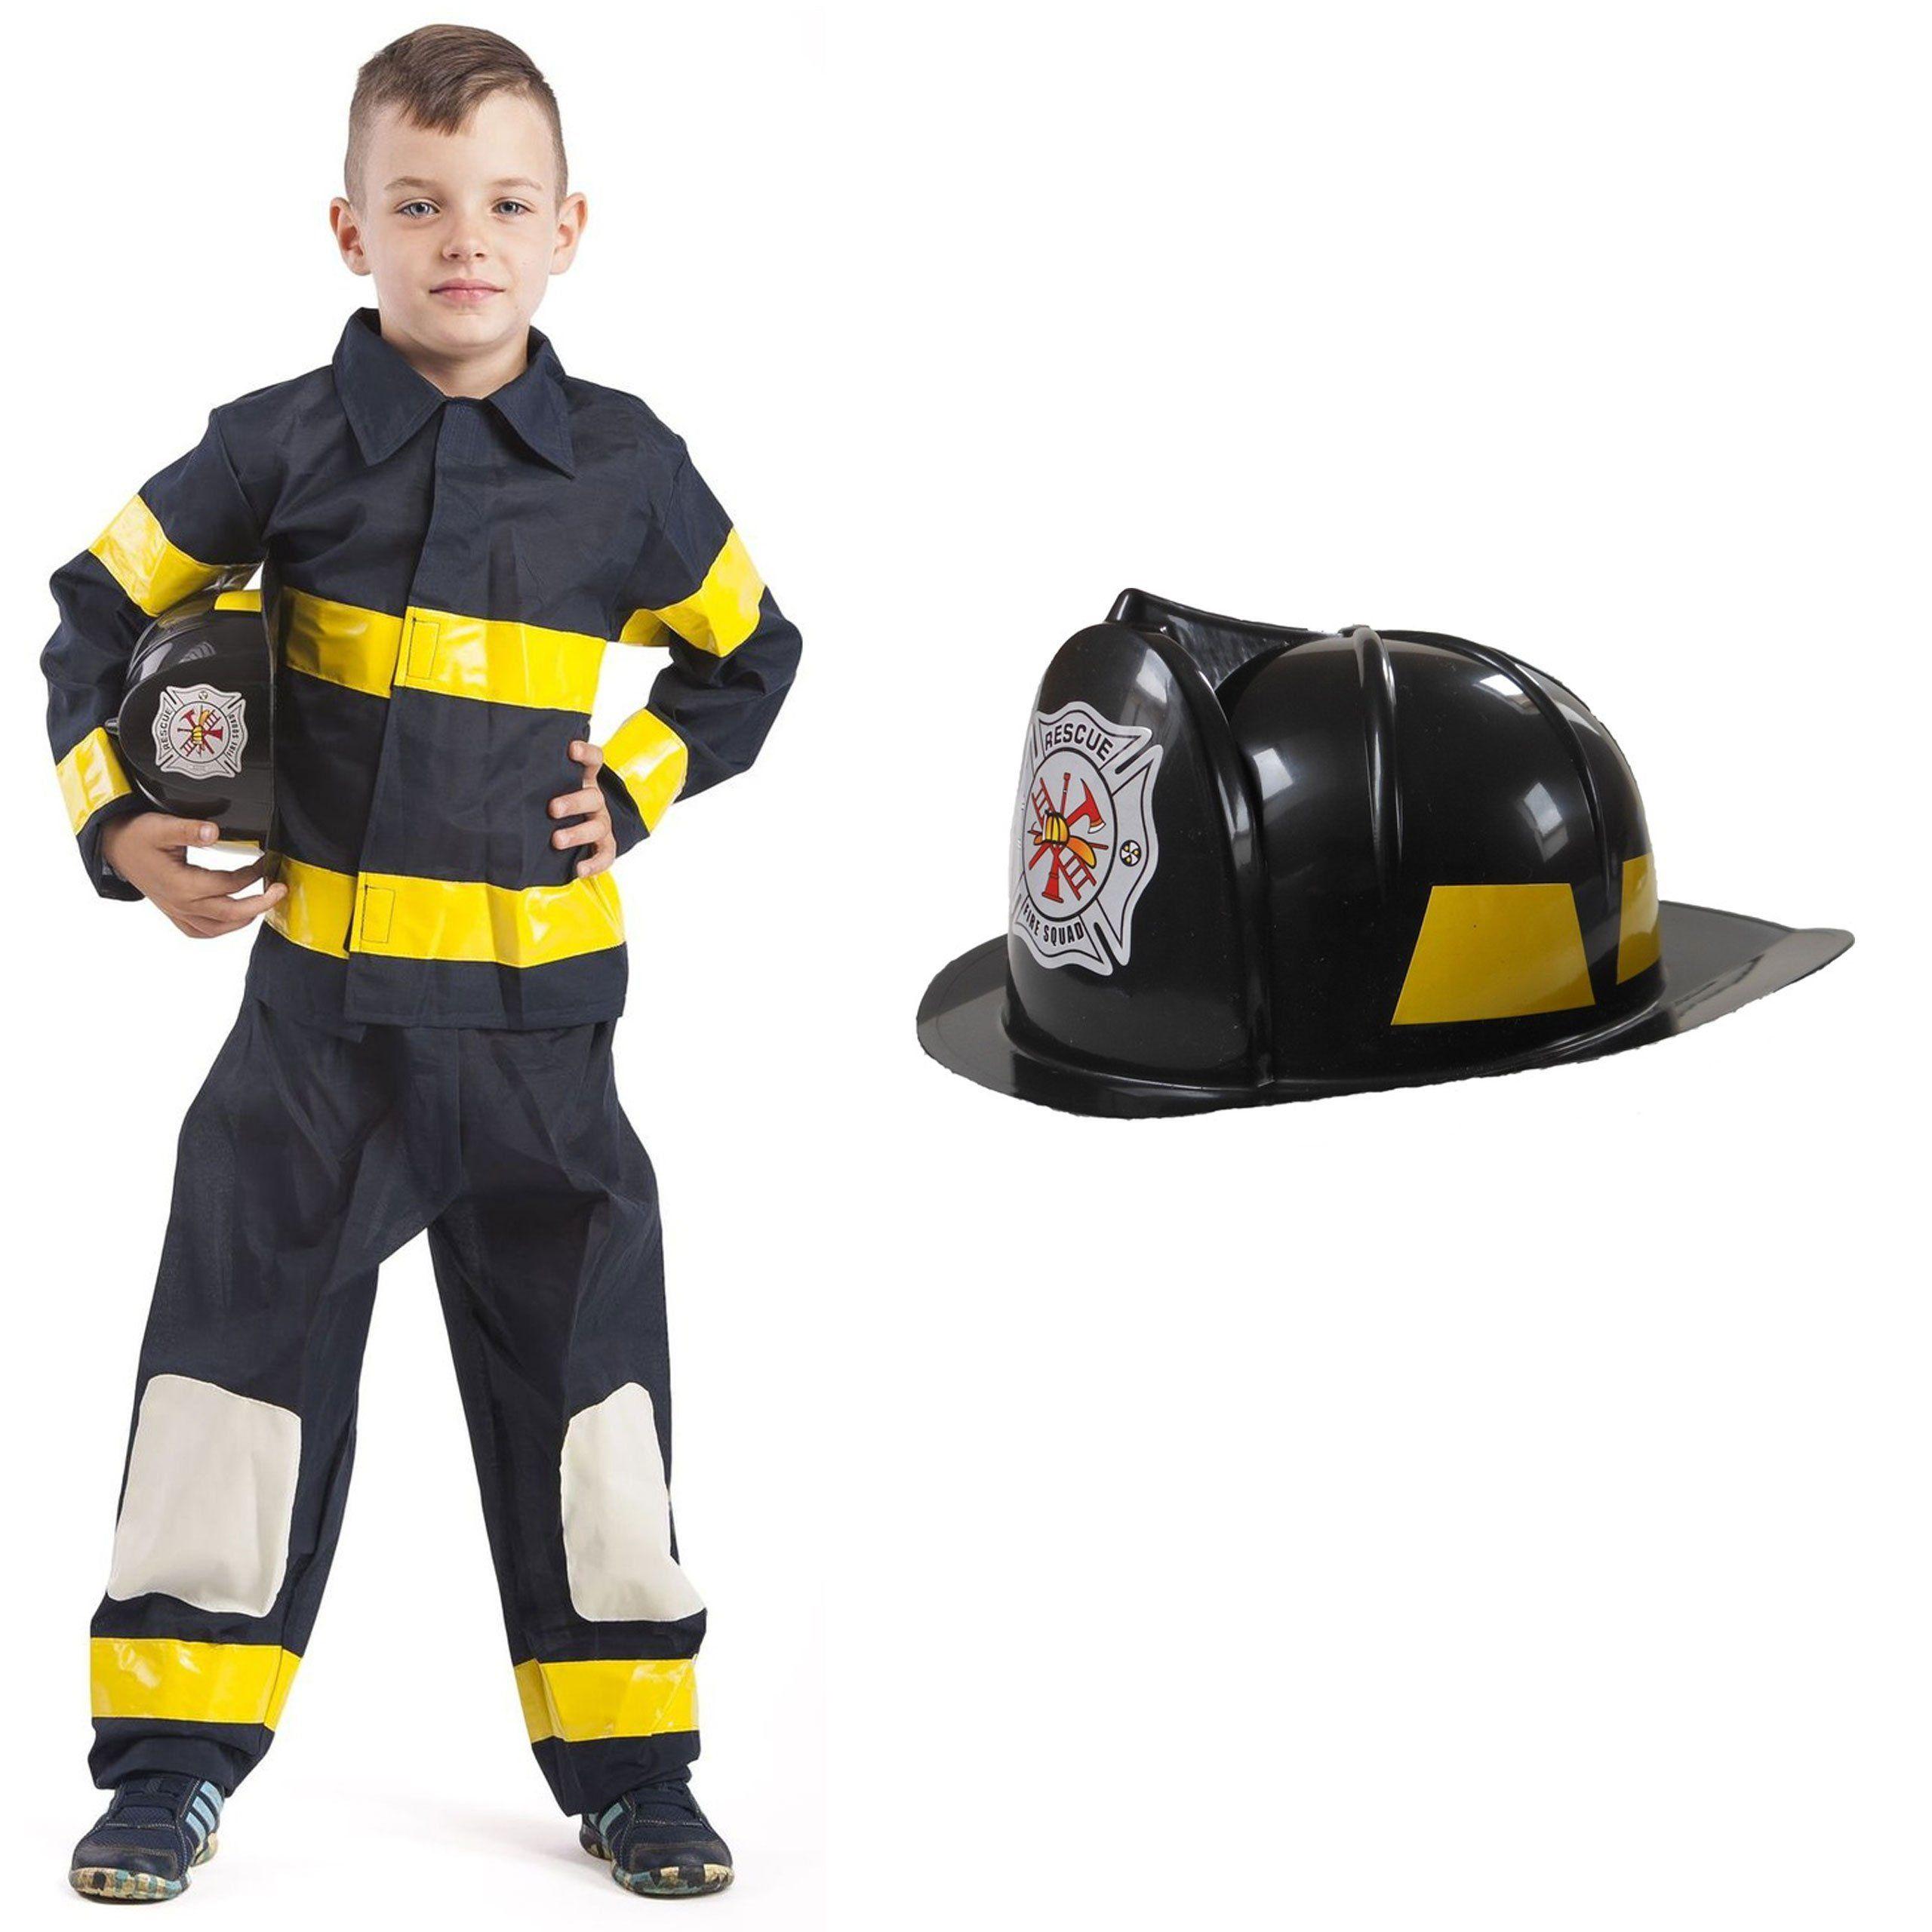 b9b404e8cb07f7 Strój Strażak Kostium Strażaka Mundur Kask Straż Pożarna dloa dziecka  134-140cm https:/